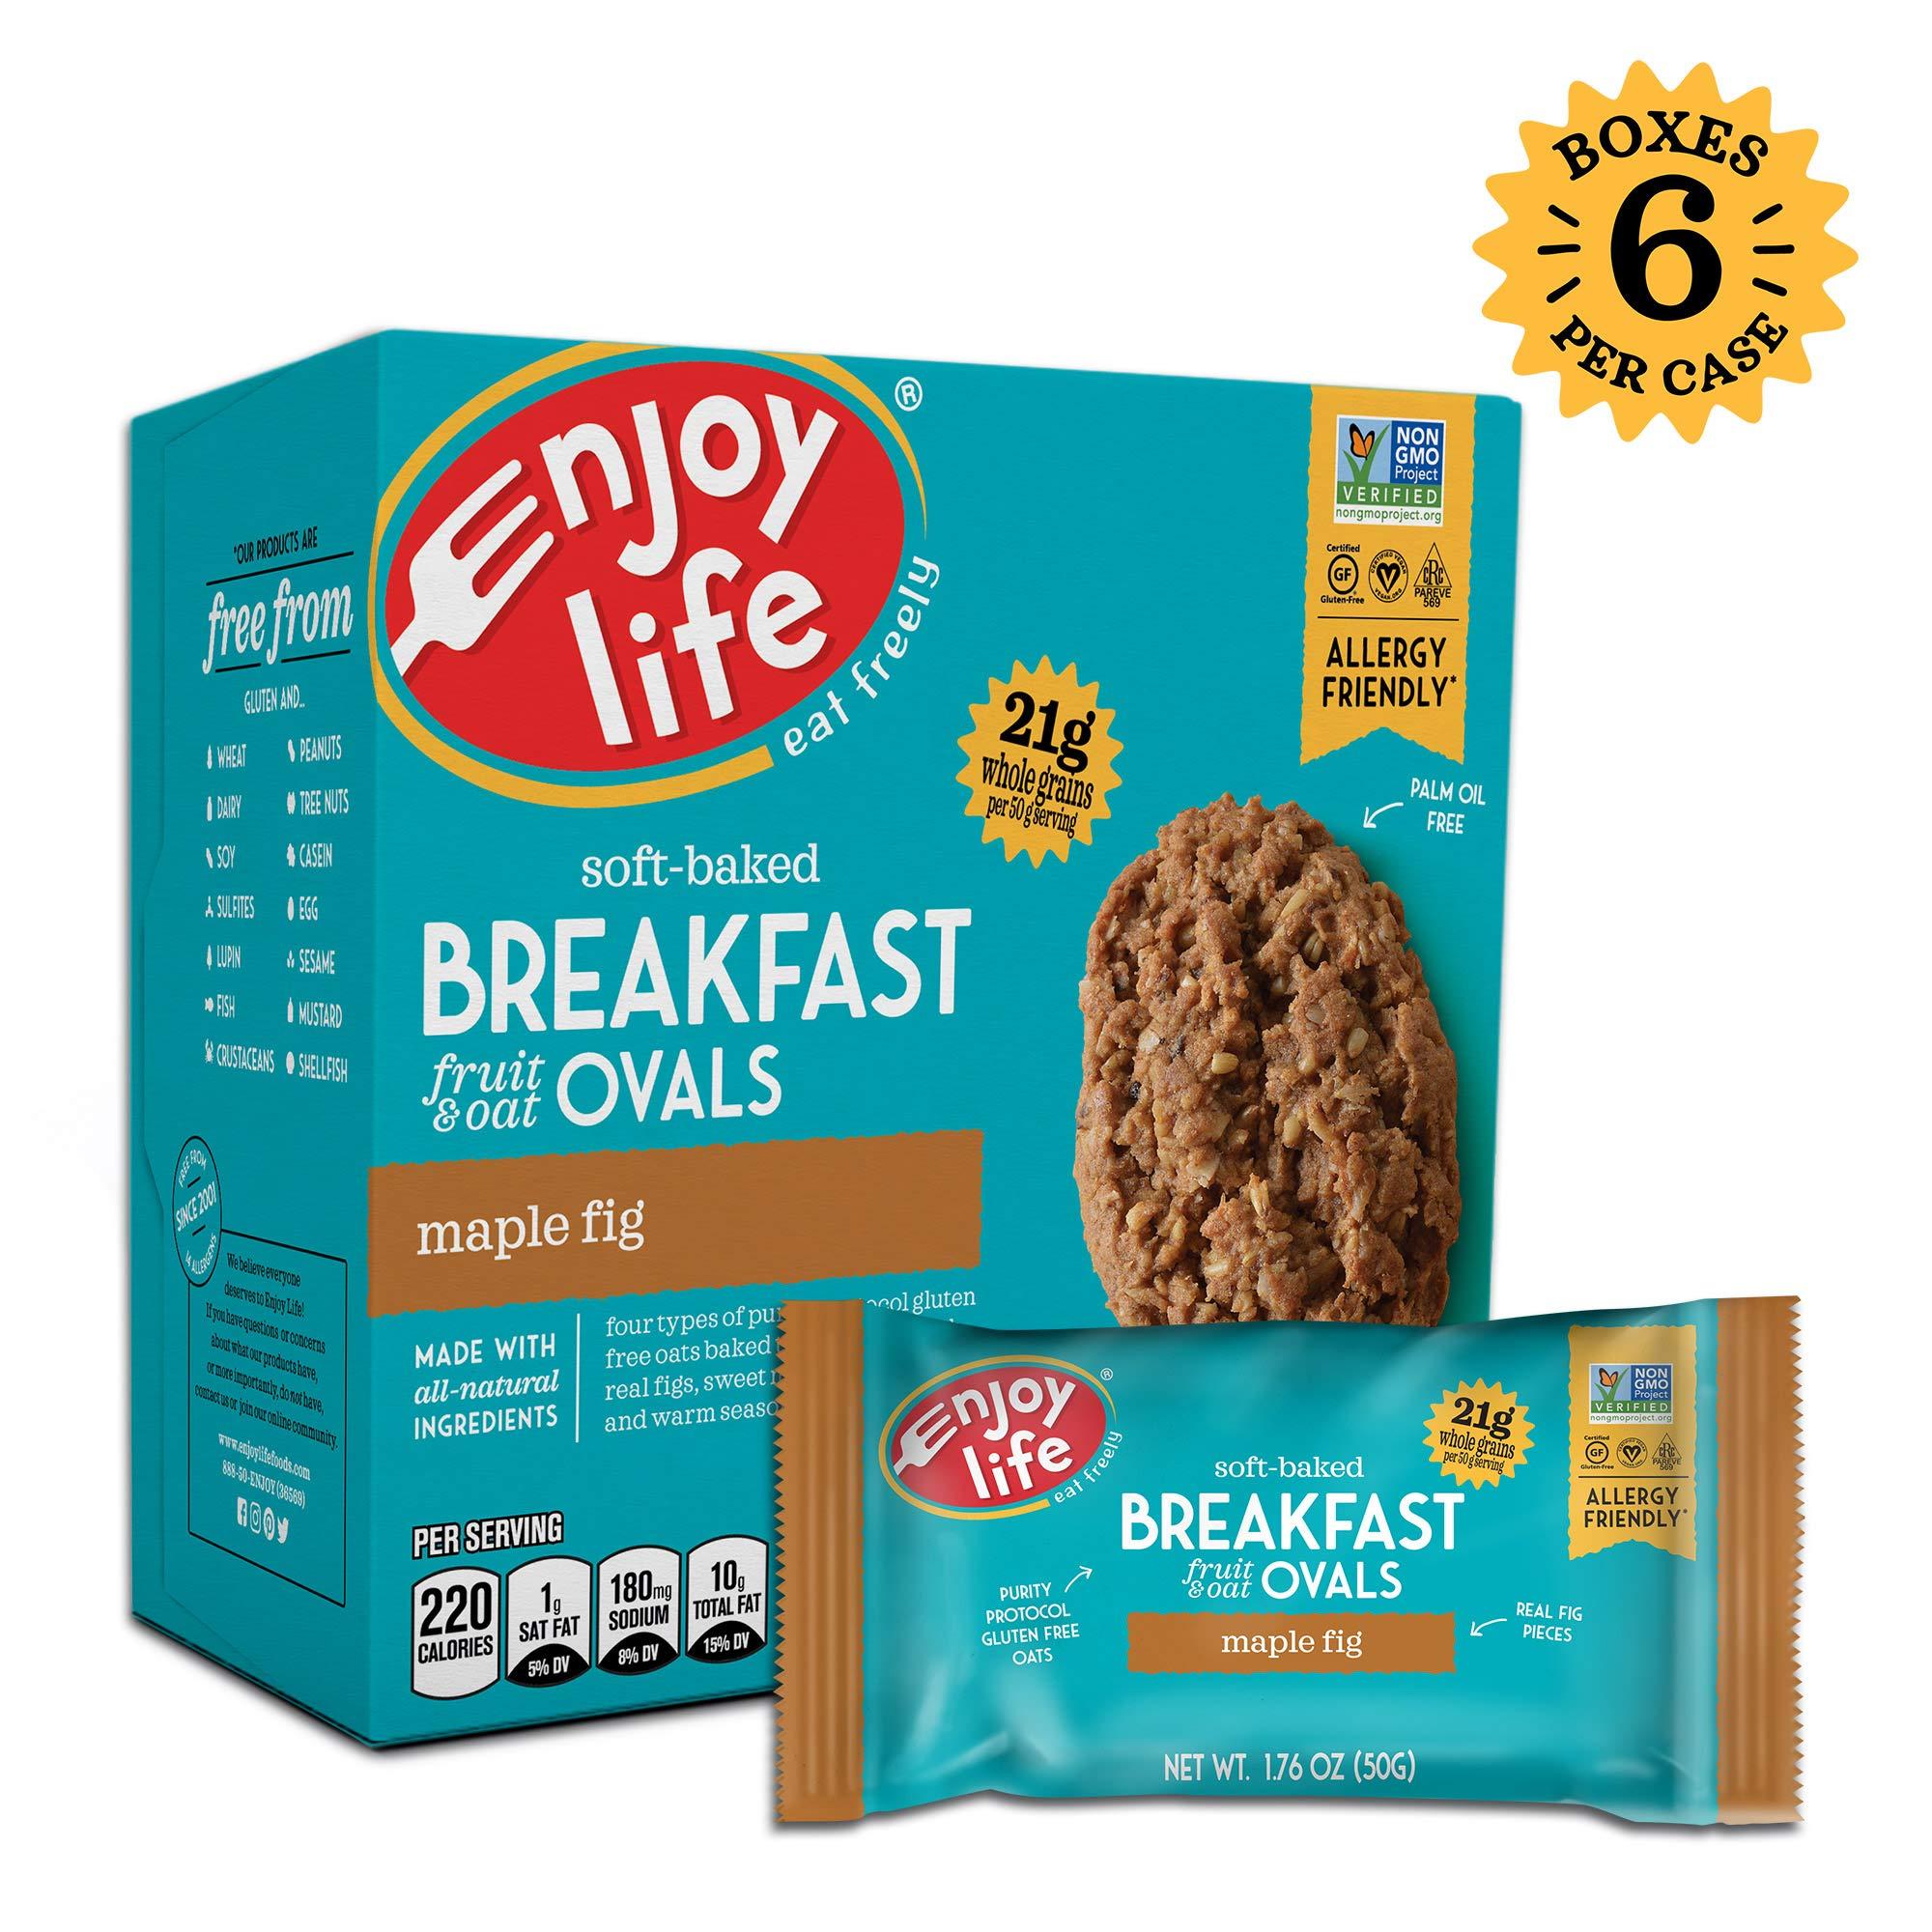 Enjoy Life Gluten Free Nut Free & Vegan Breakfast Cookies, Maple Fig, 6 Count Boxes, 30 Bars by Enjoy Life Foods